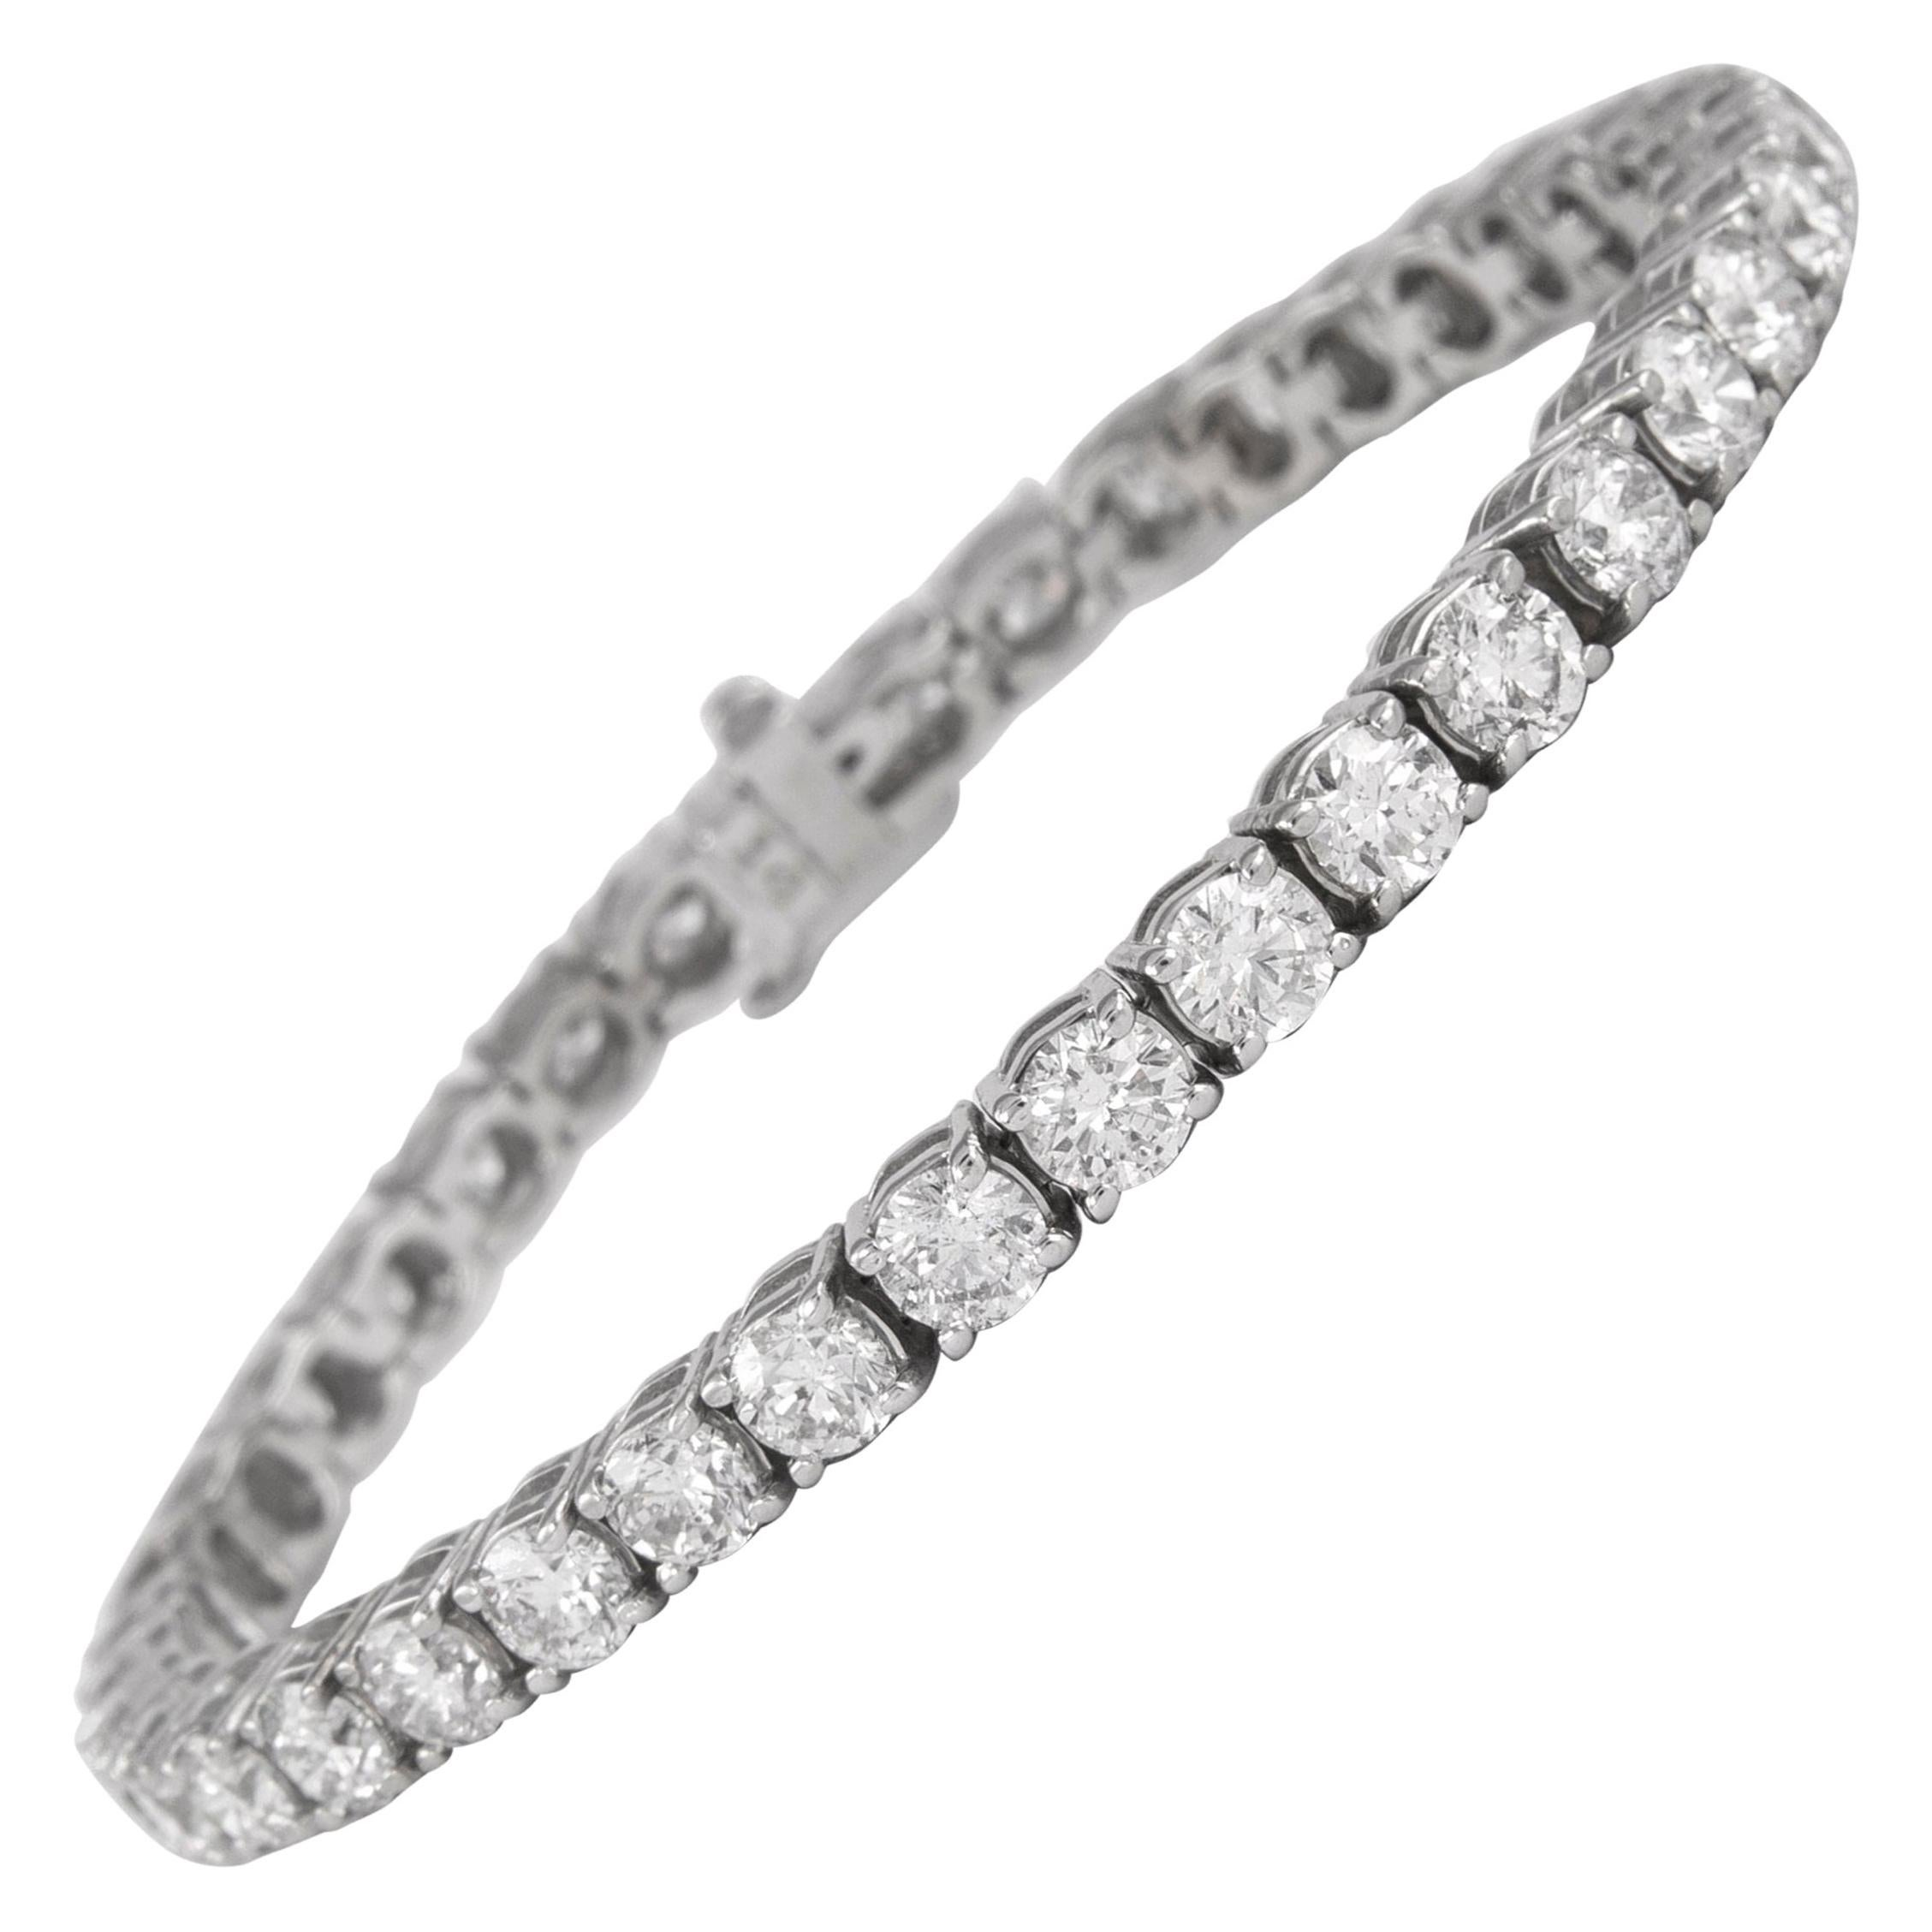 Alexander 10.41 Carat Diamond Tennis Bracelet 18 Karat White Gold